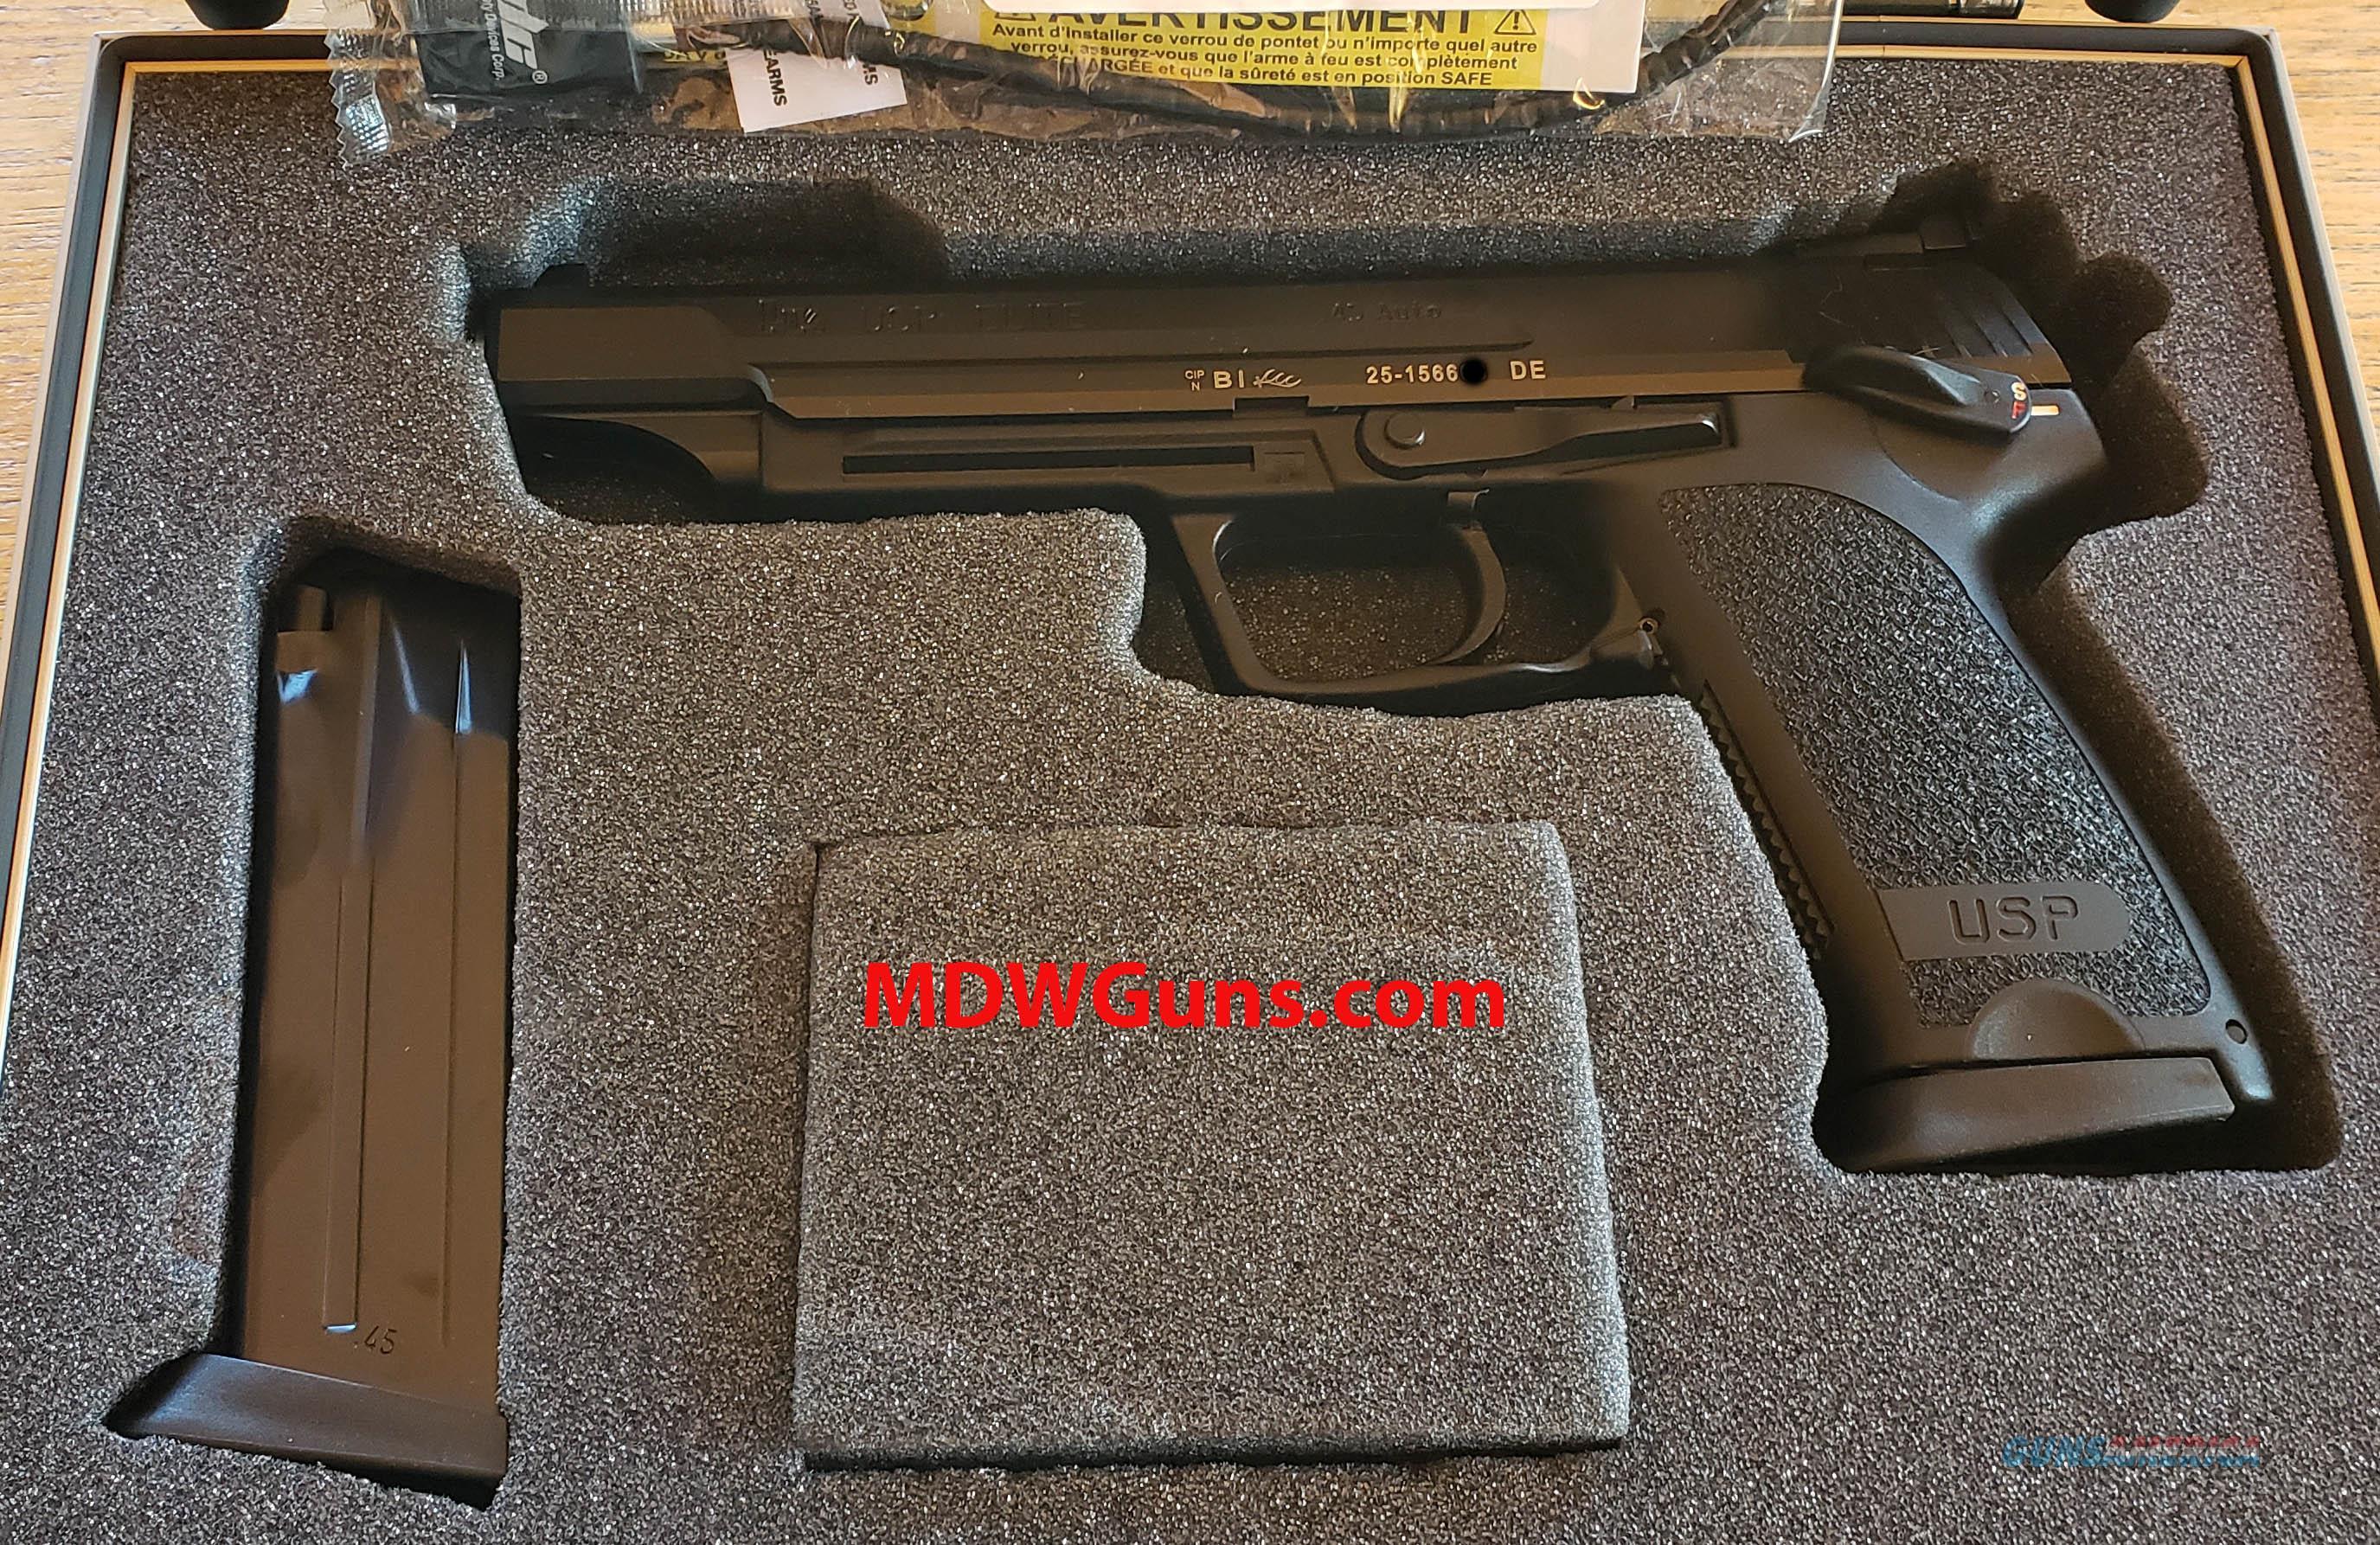 HK USP ELITE .45ACP  Guns > Pistols > Heckler & Koch Pistols > Polymer Frame